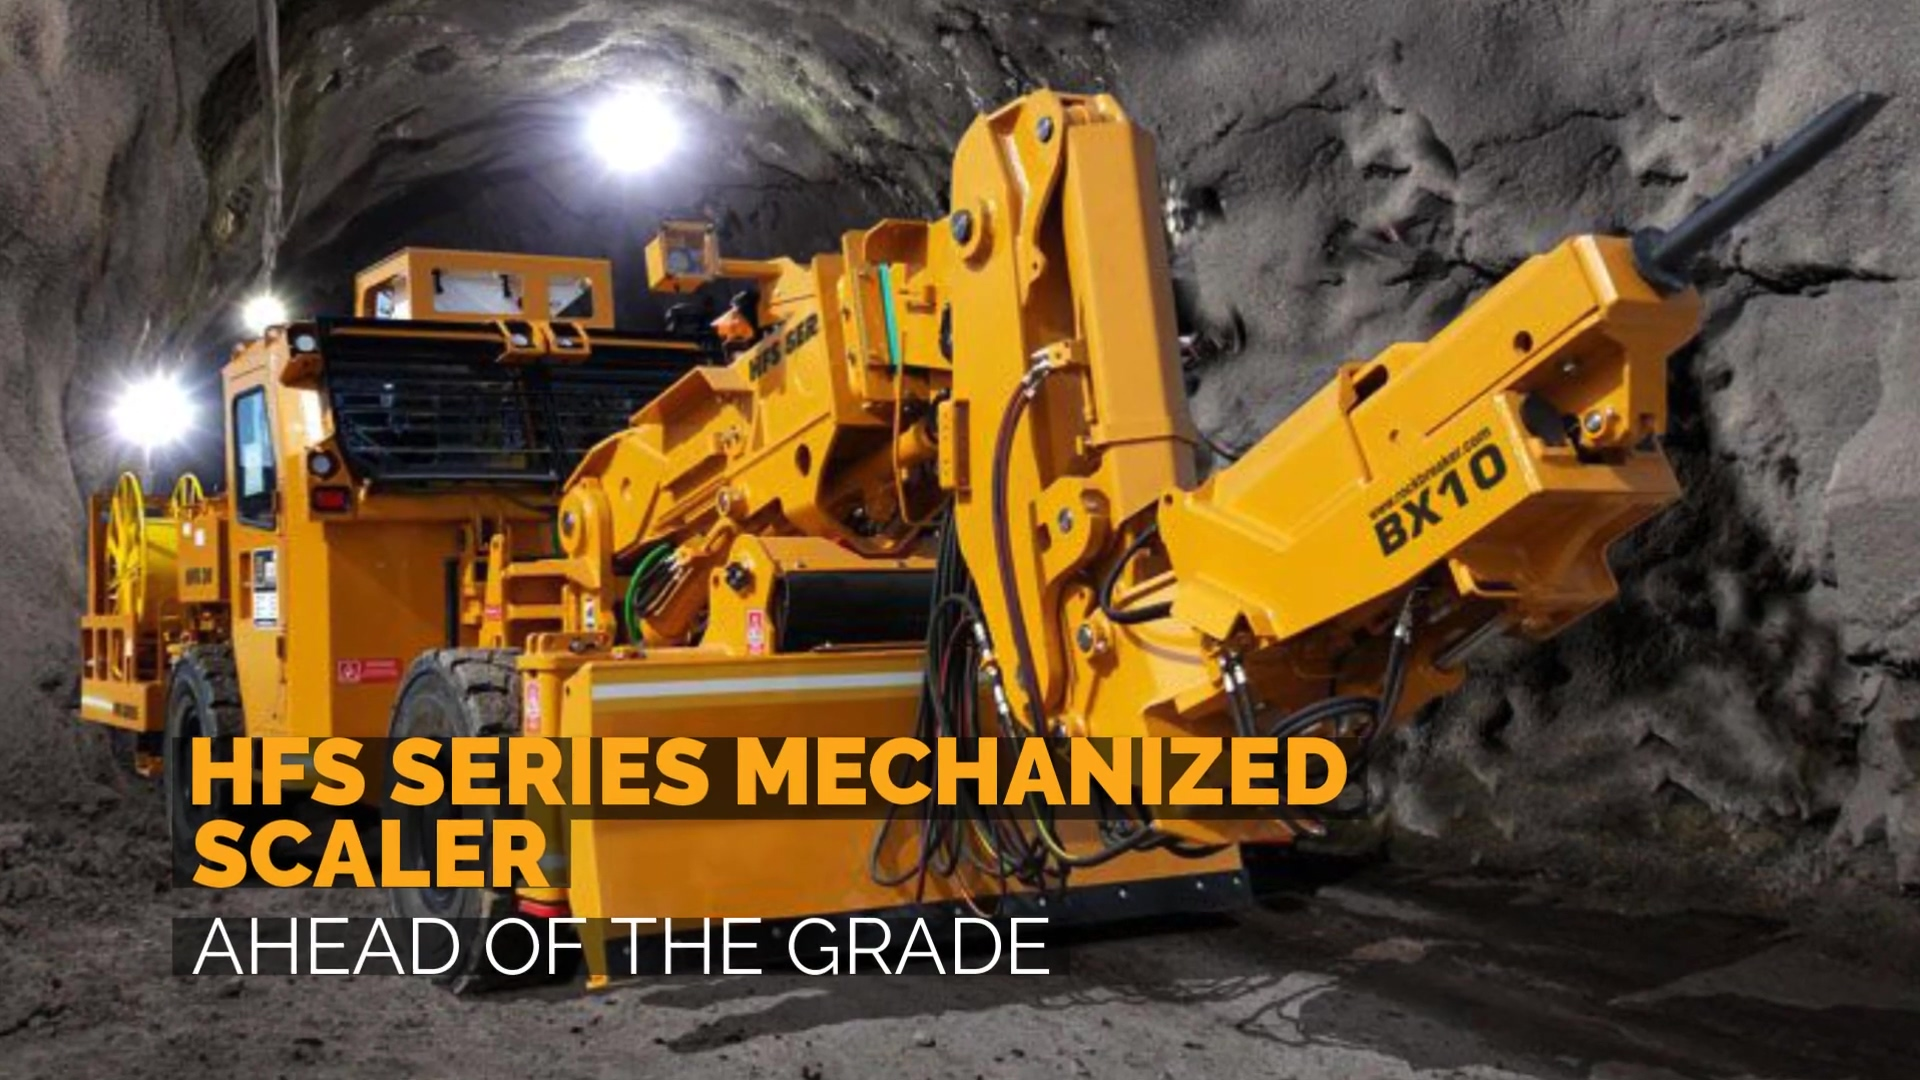 Breaker Technology   HFS Mechanized Scaler   Ahead of The Grade